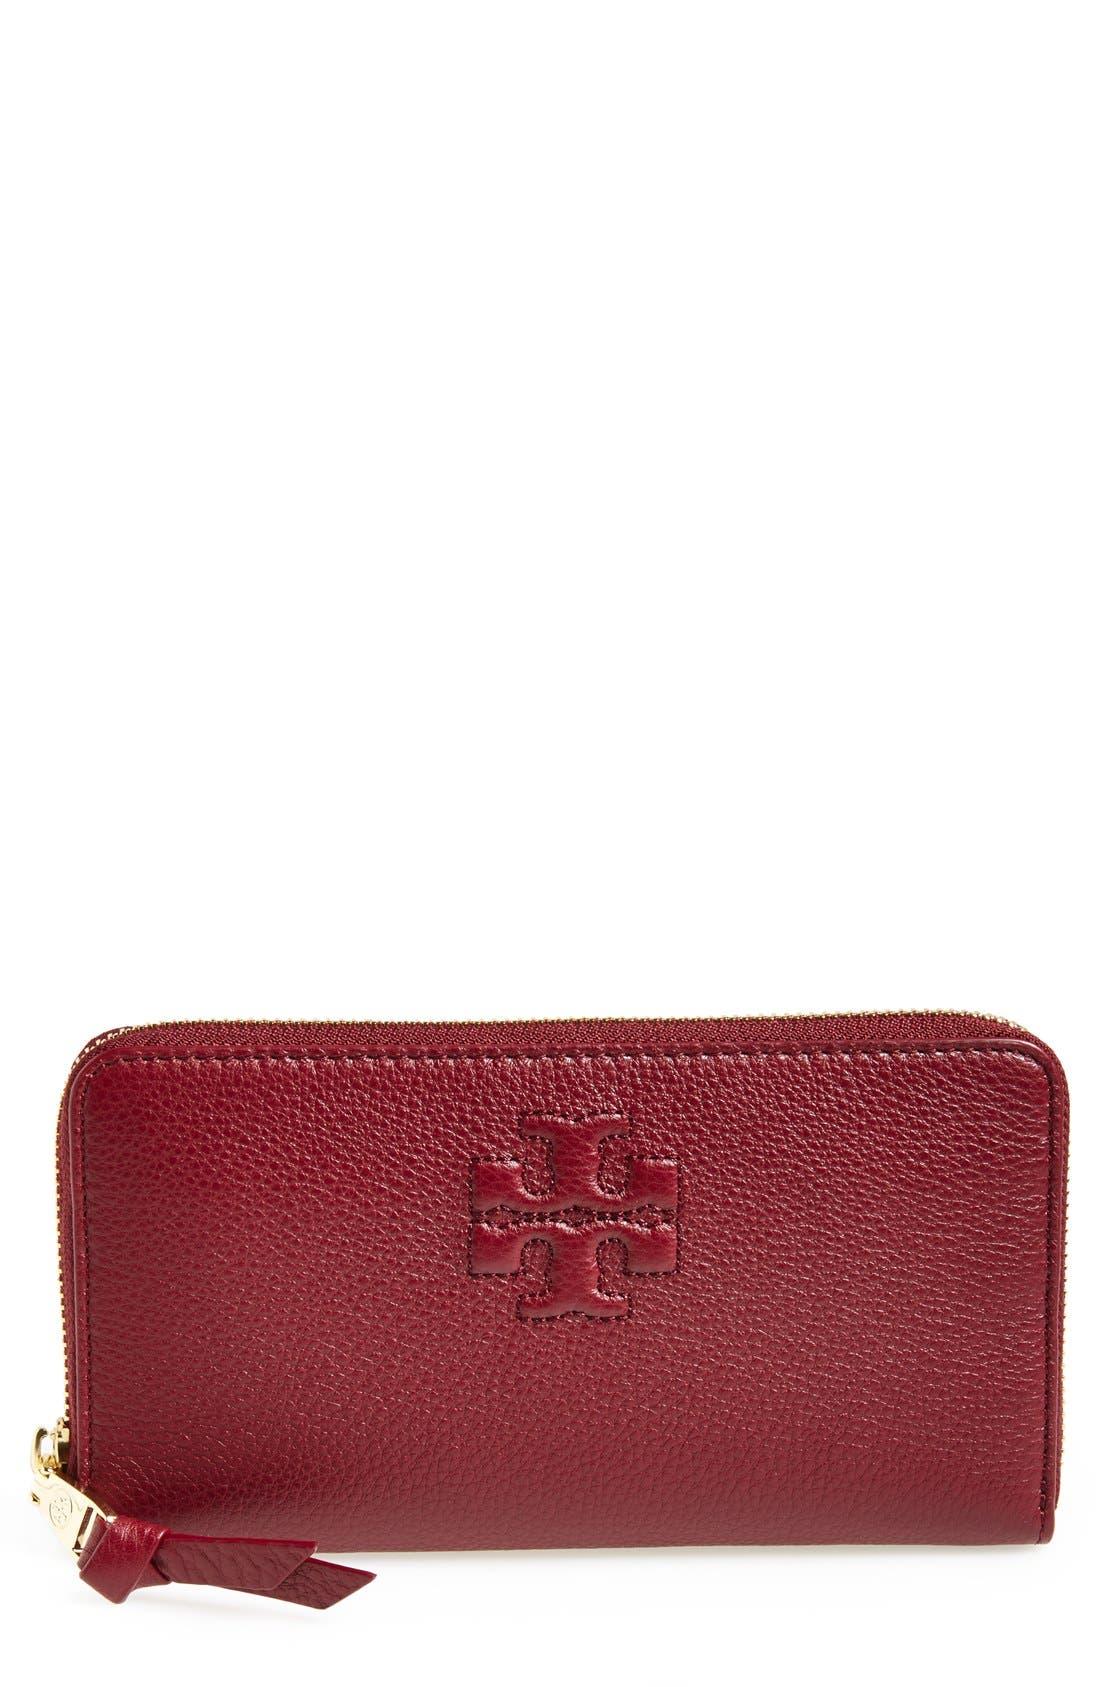 Alternate Image 1 Selected - Tory Burch 'Thea' Zip Around Wallet